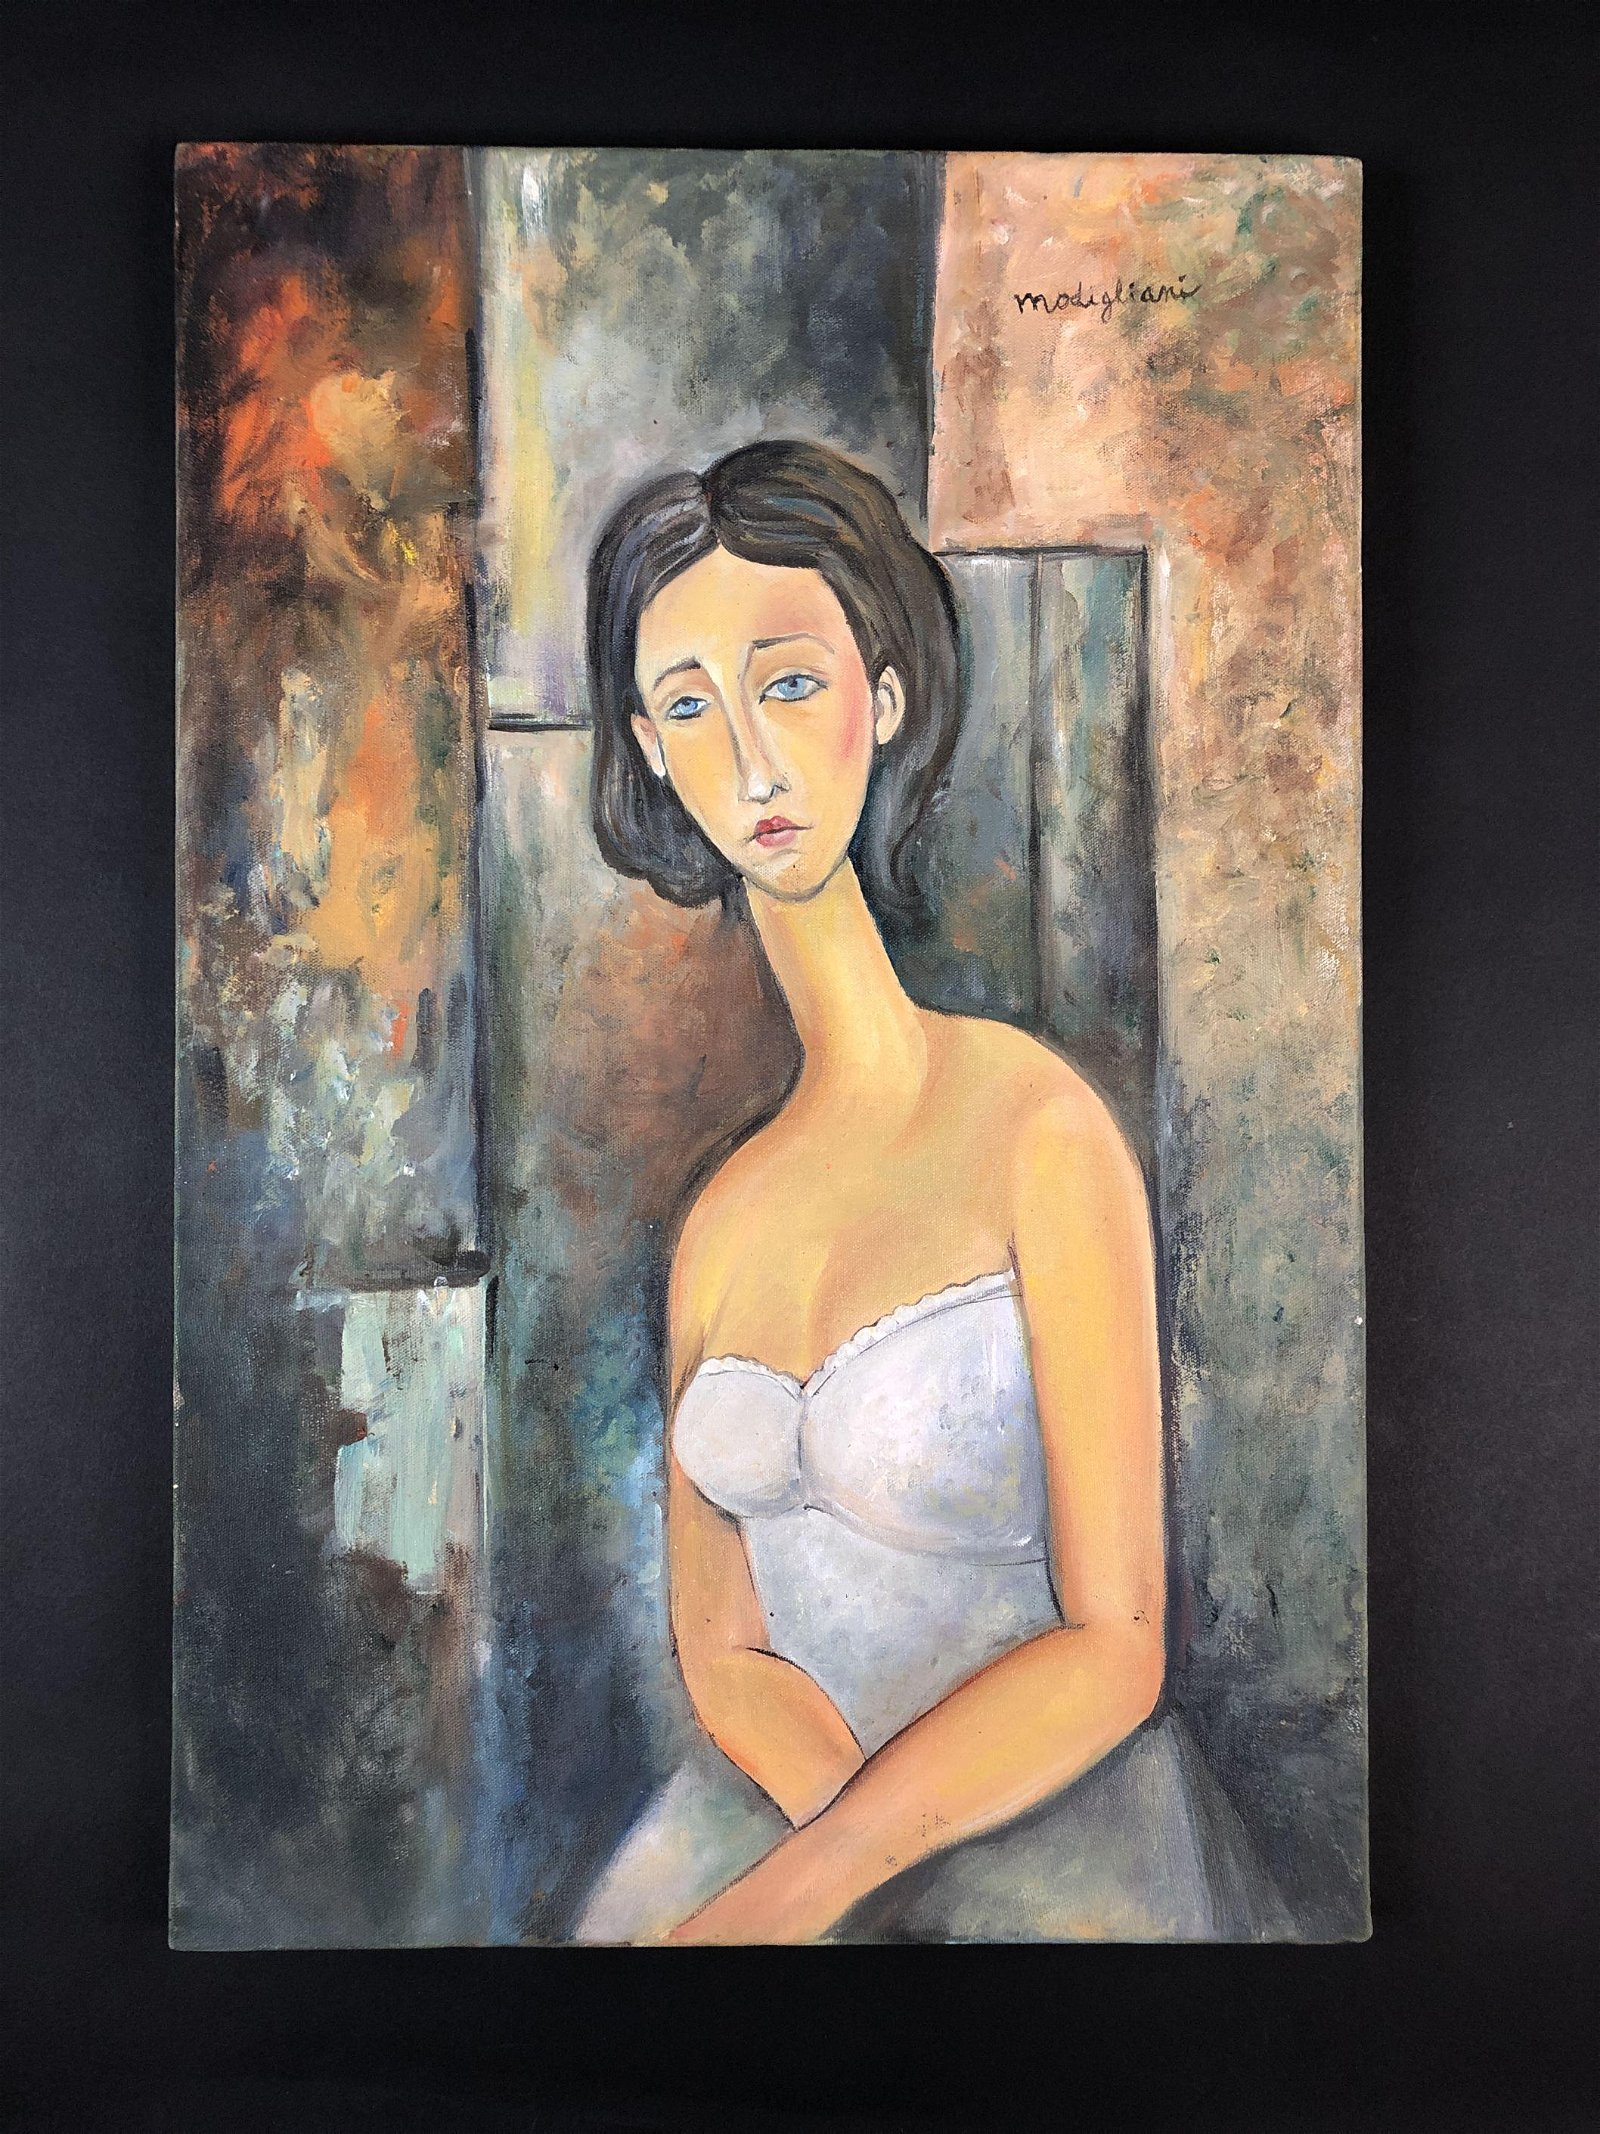 Amedeo Modigliani (Italian, 1884-1920) - Oil on Canvas